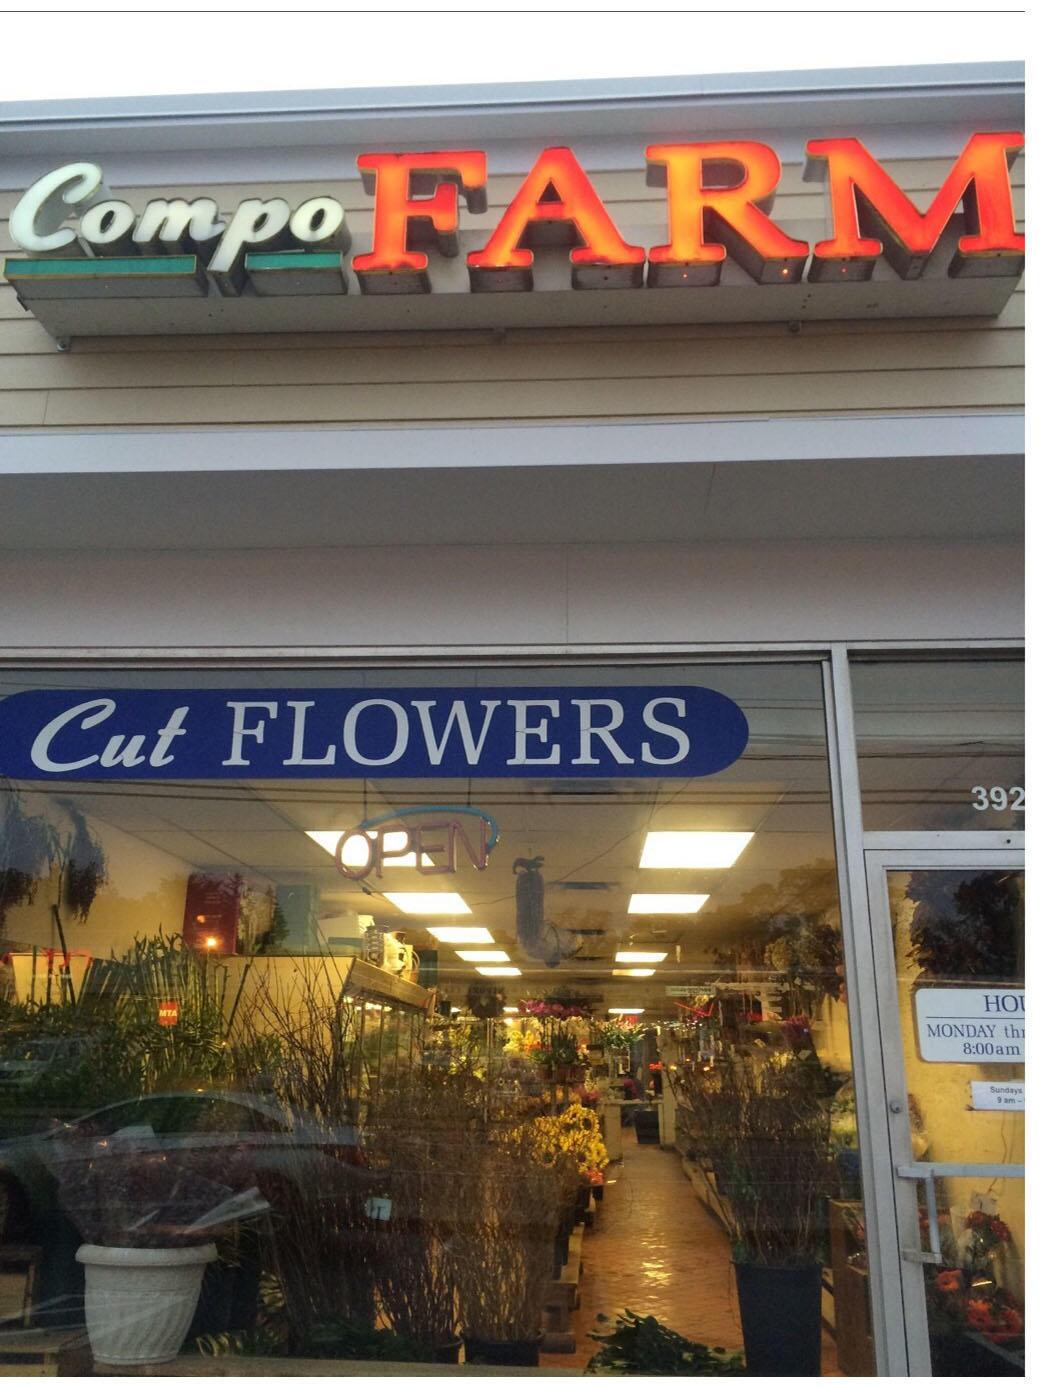 Compo Farm Flowers image 14